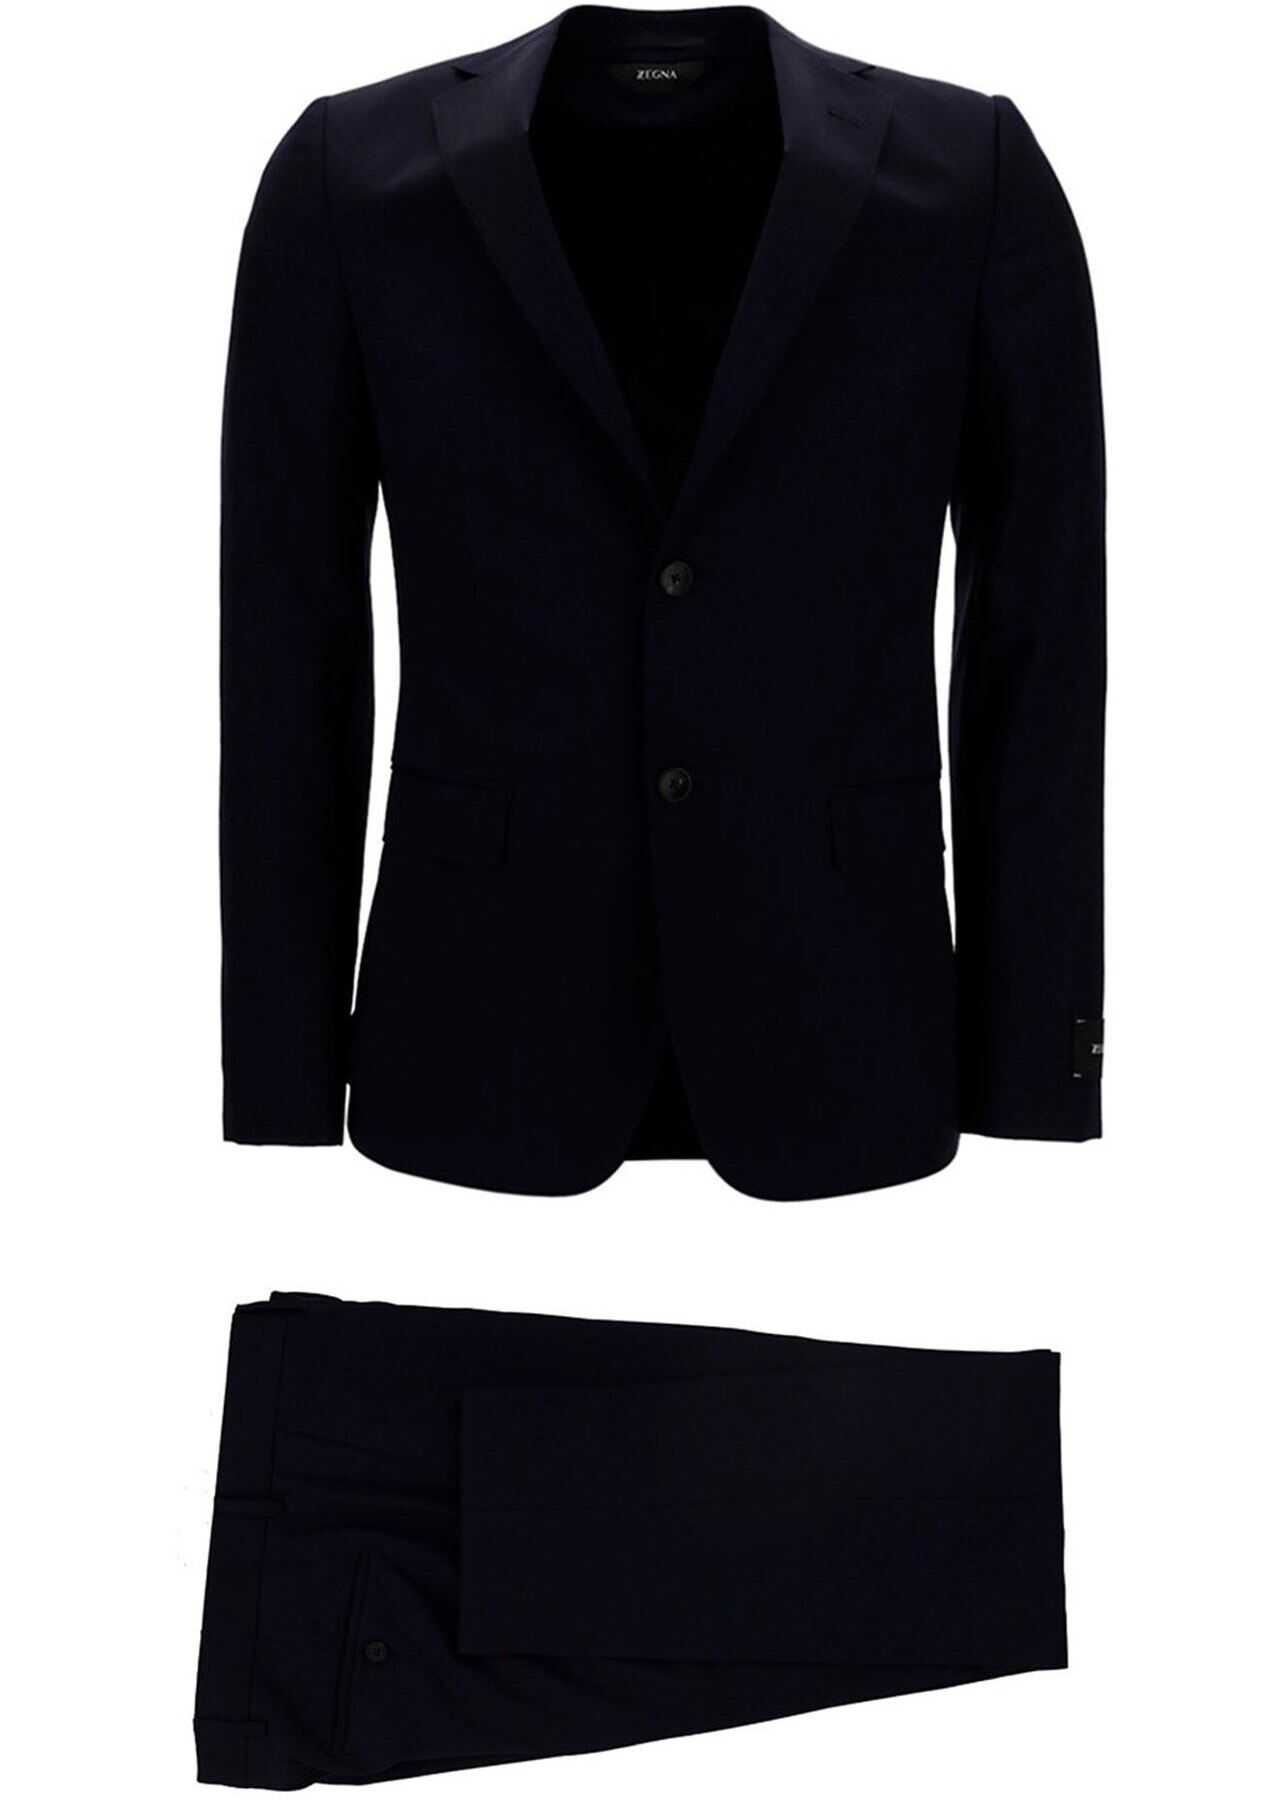 Z Zegna Wool Suit In Black Black imagine